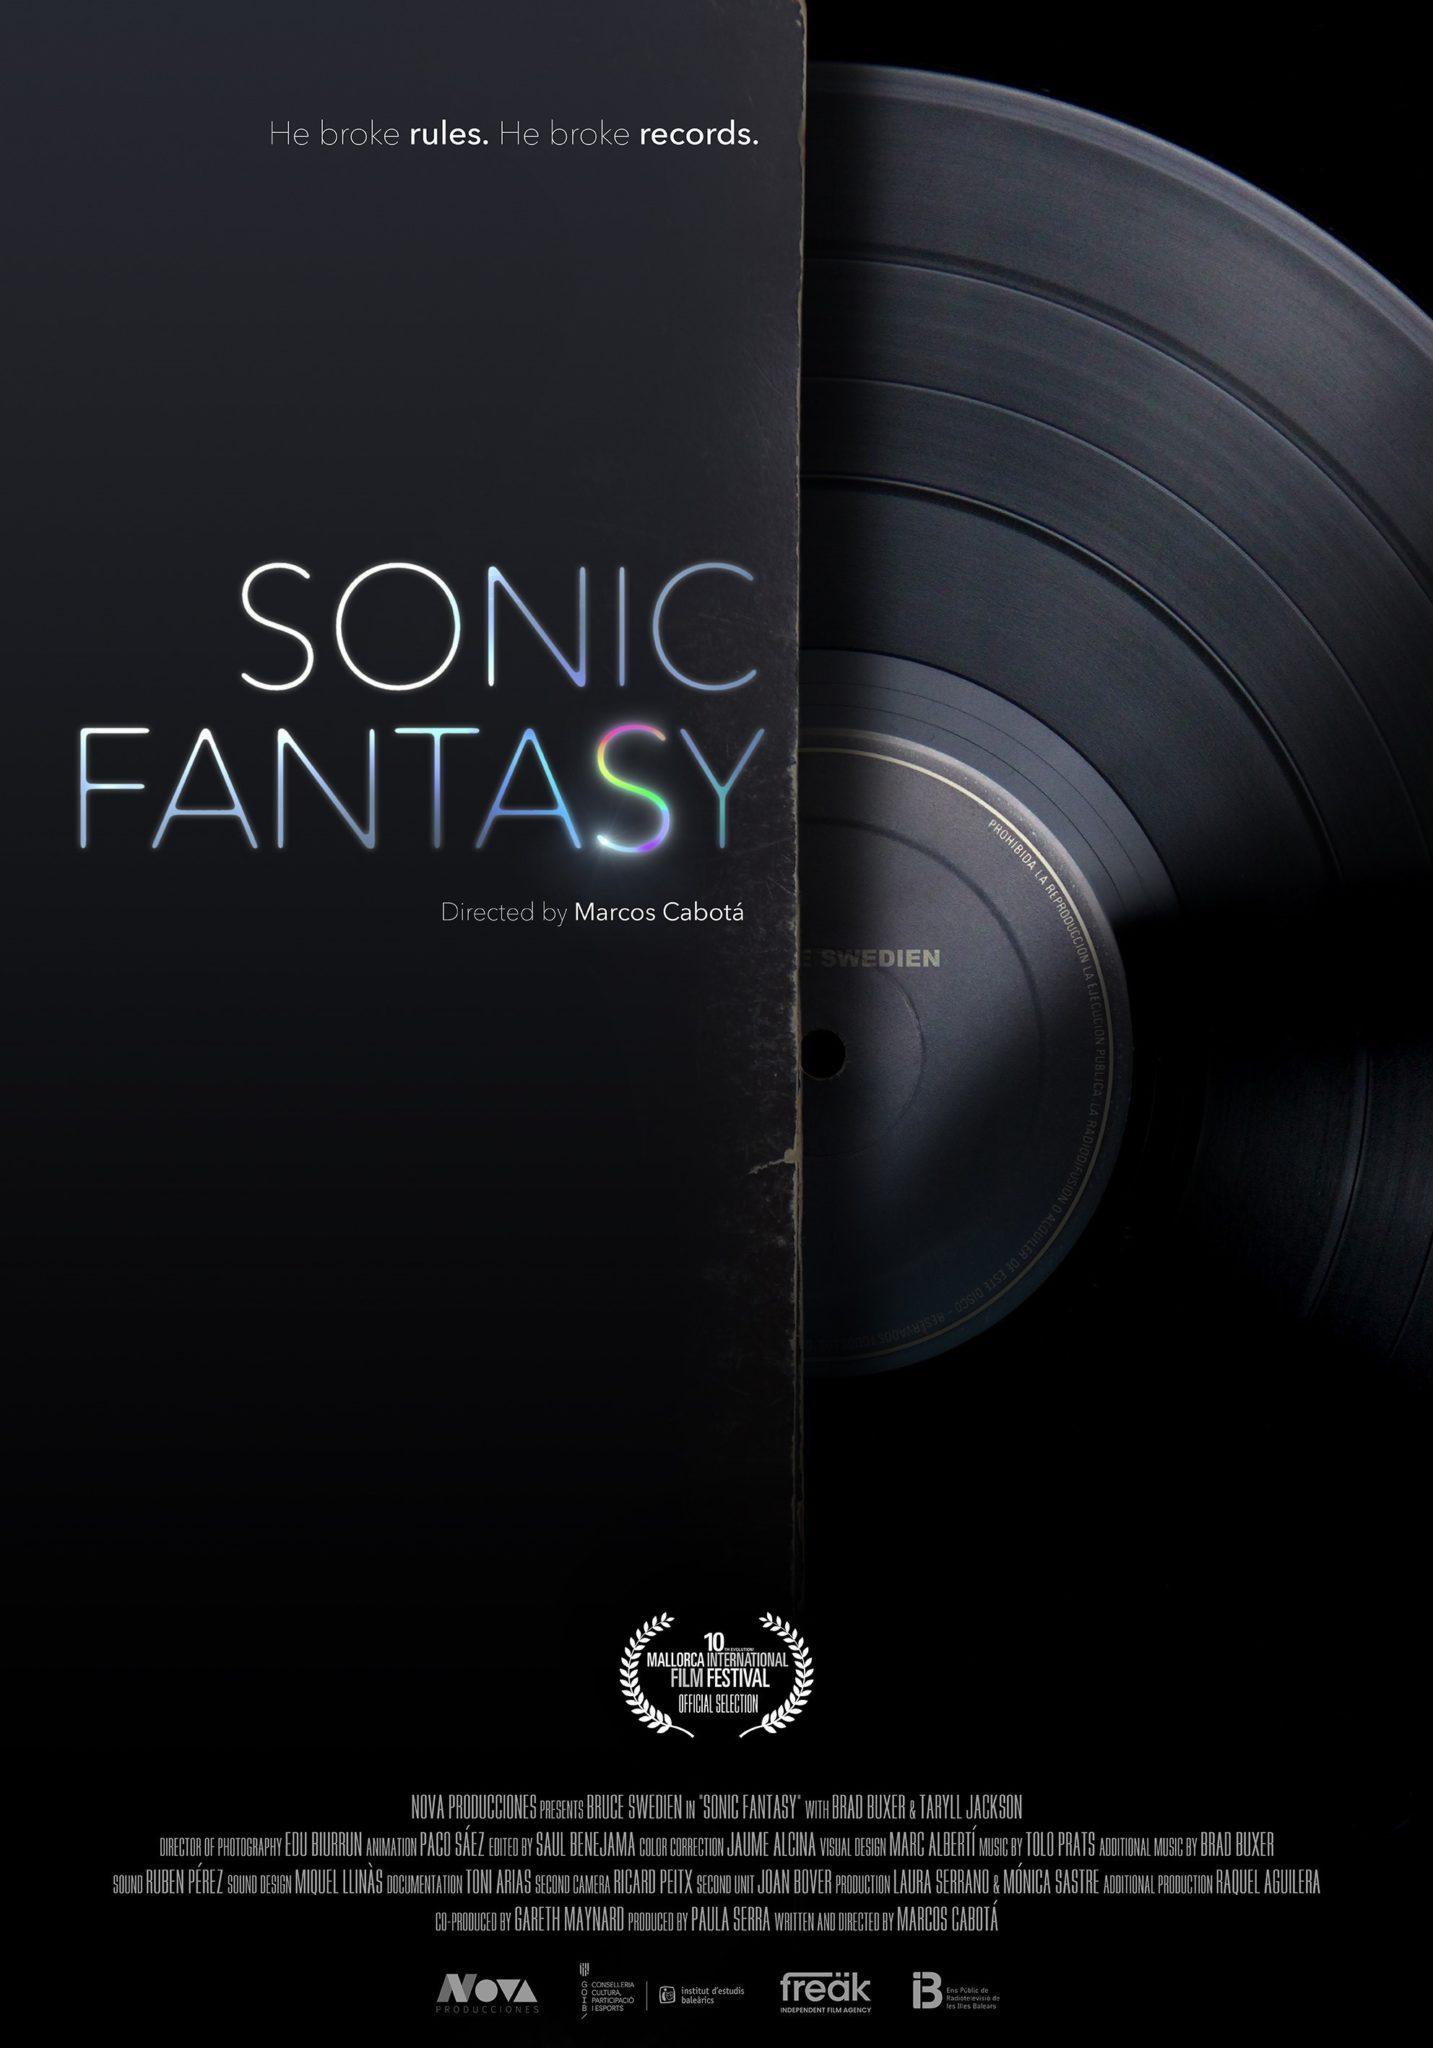 Sonic Fantasy